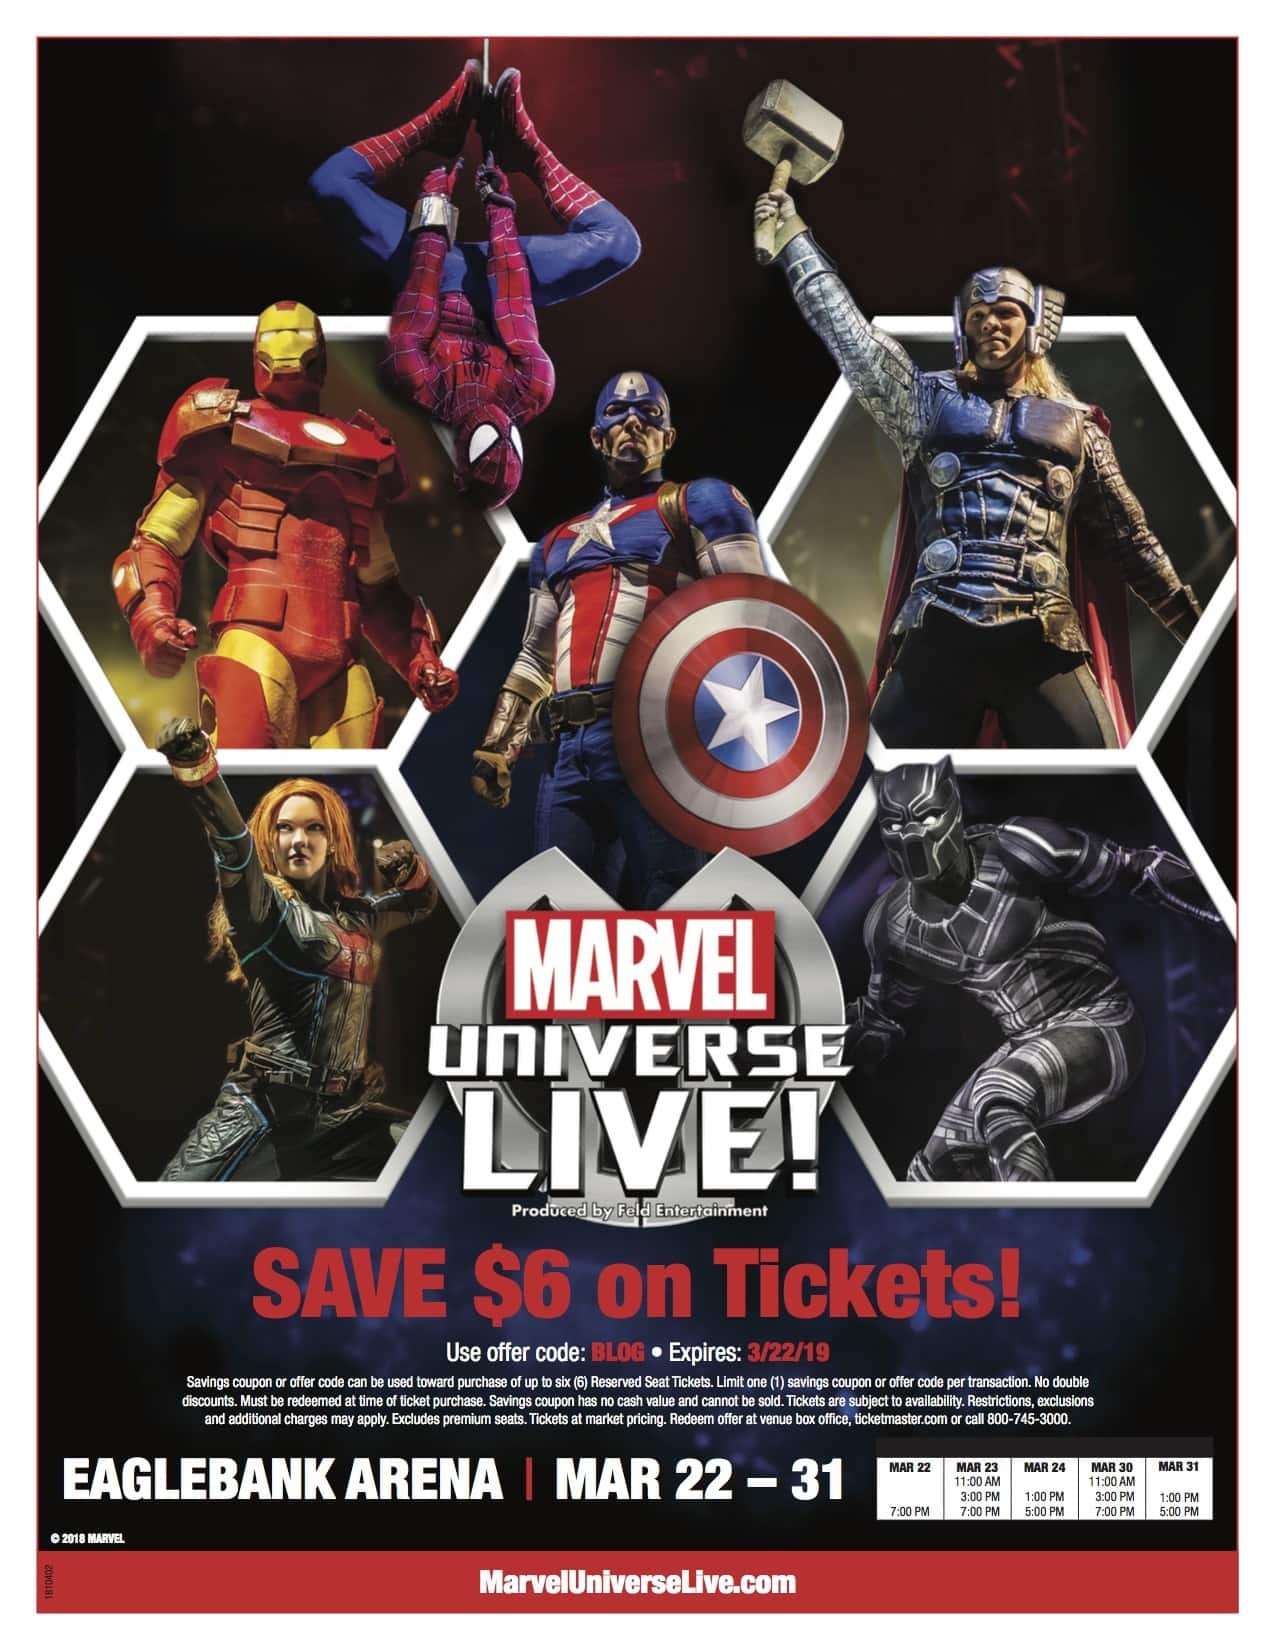 Marvel Universe Live Ticket Giveaway